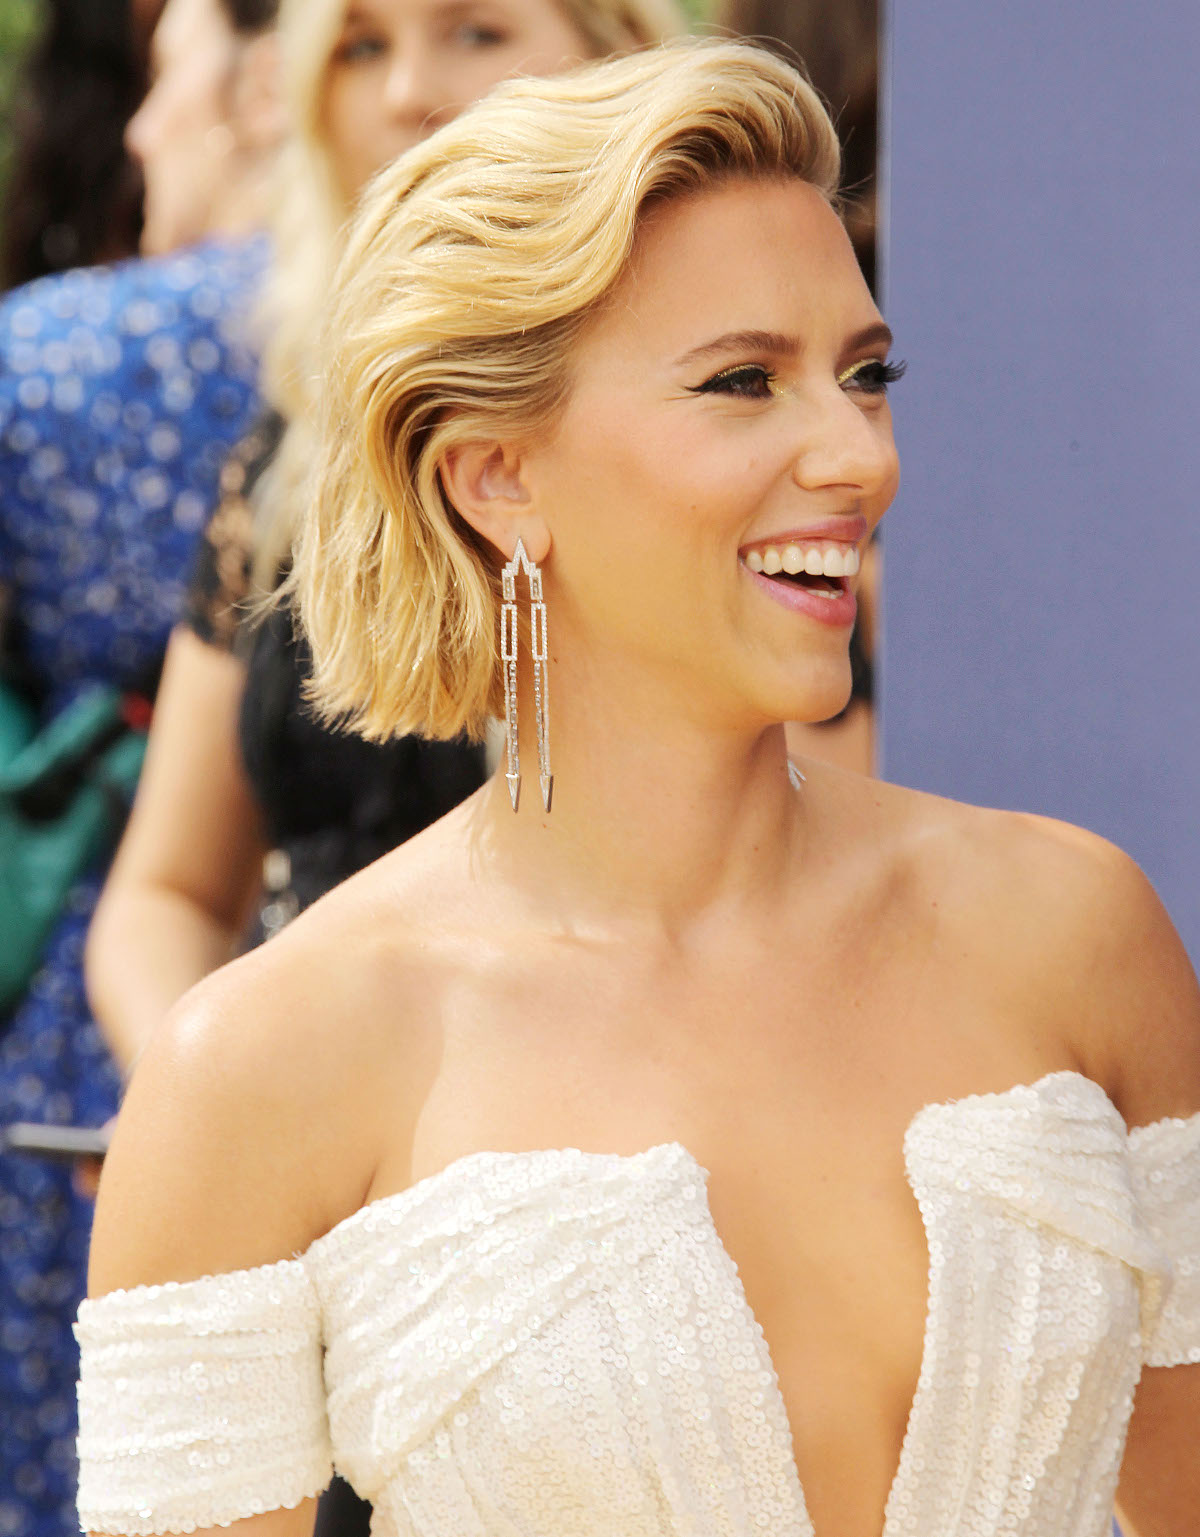 Celebrities attend the 70th Emmy Awards in Los Angeles, CA.  Pictured: Scarlett Johansson,Keltie Knight Ref: SPL5025241 170918 NON-EXCLUSIVE Picture by: SplashNews.com  Splash News and Pictures Los Angeles: 310-821-2666 New York: 212-619-2666 London: 0207 644 7656 Milan: +39 02 4399 8577 Sydney: +61 02 9240 7700 photodesk@splashnews.com  World Rights, No France Rights